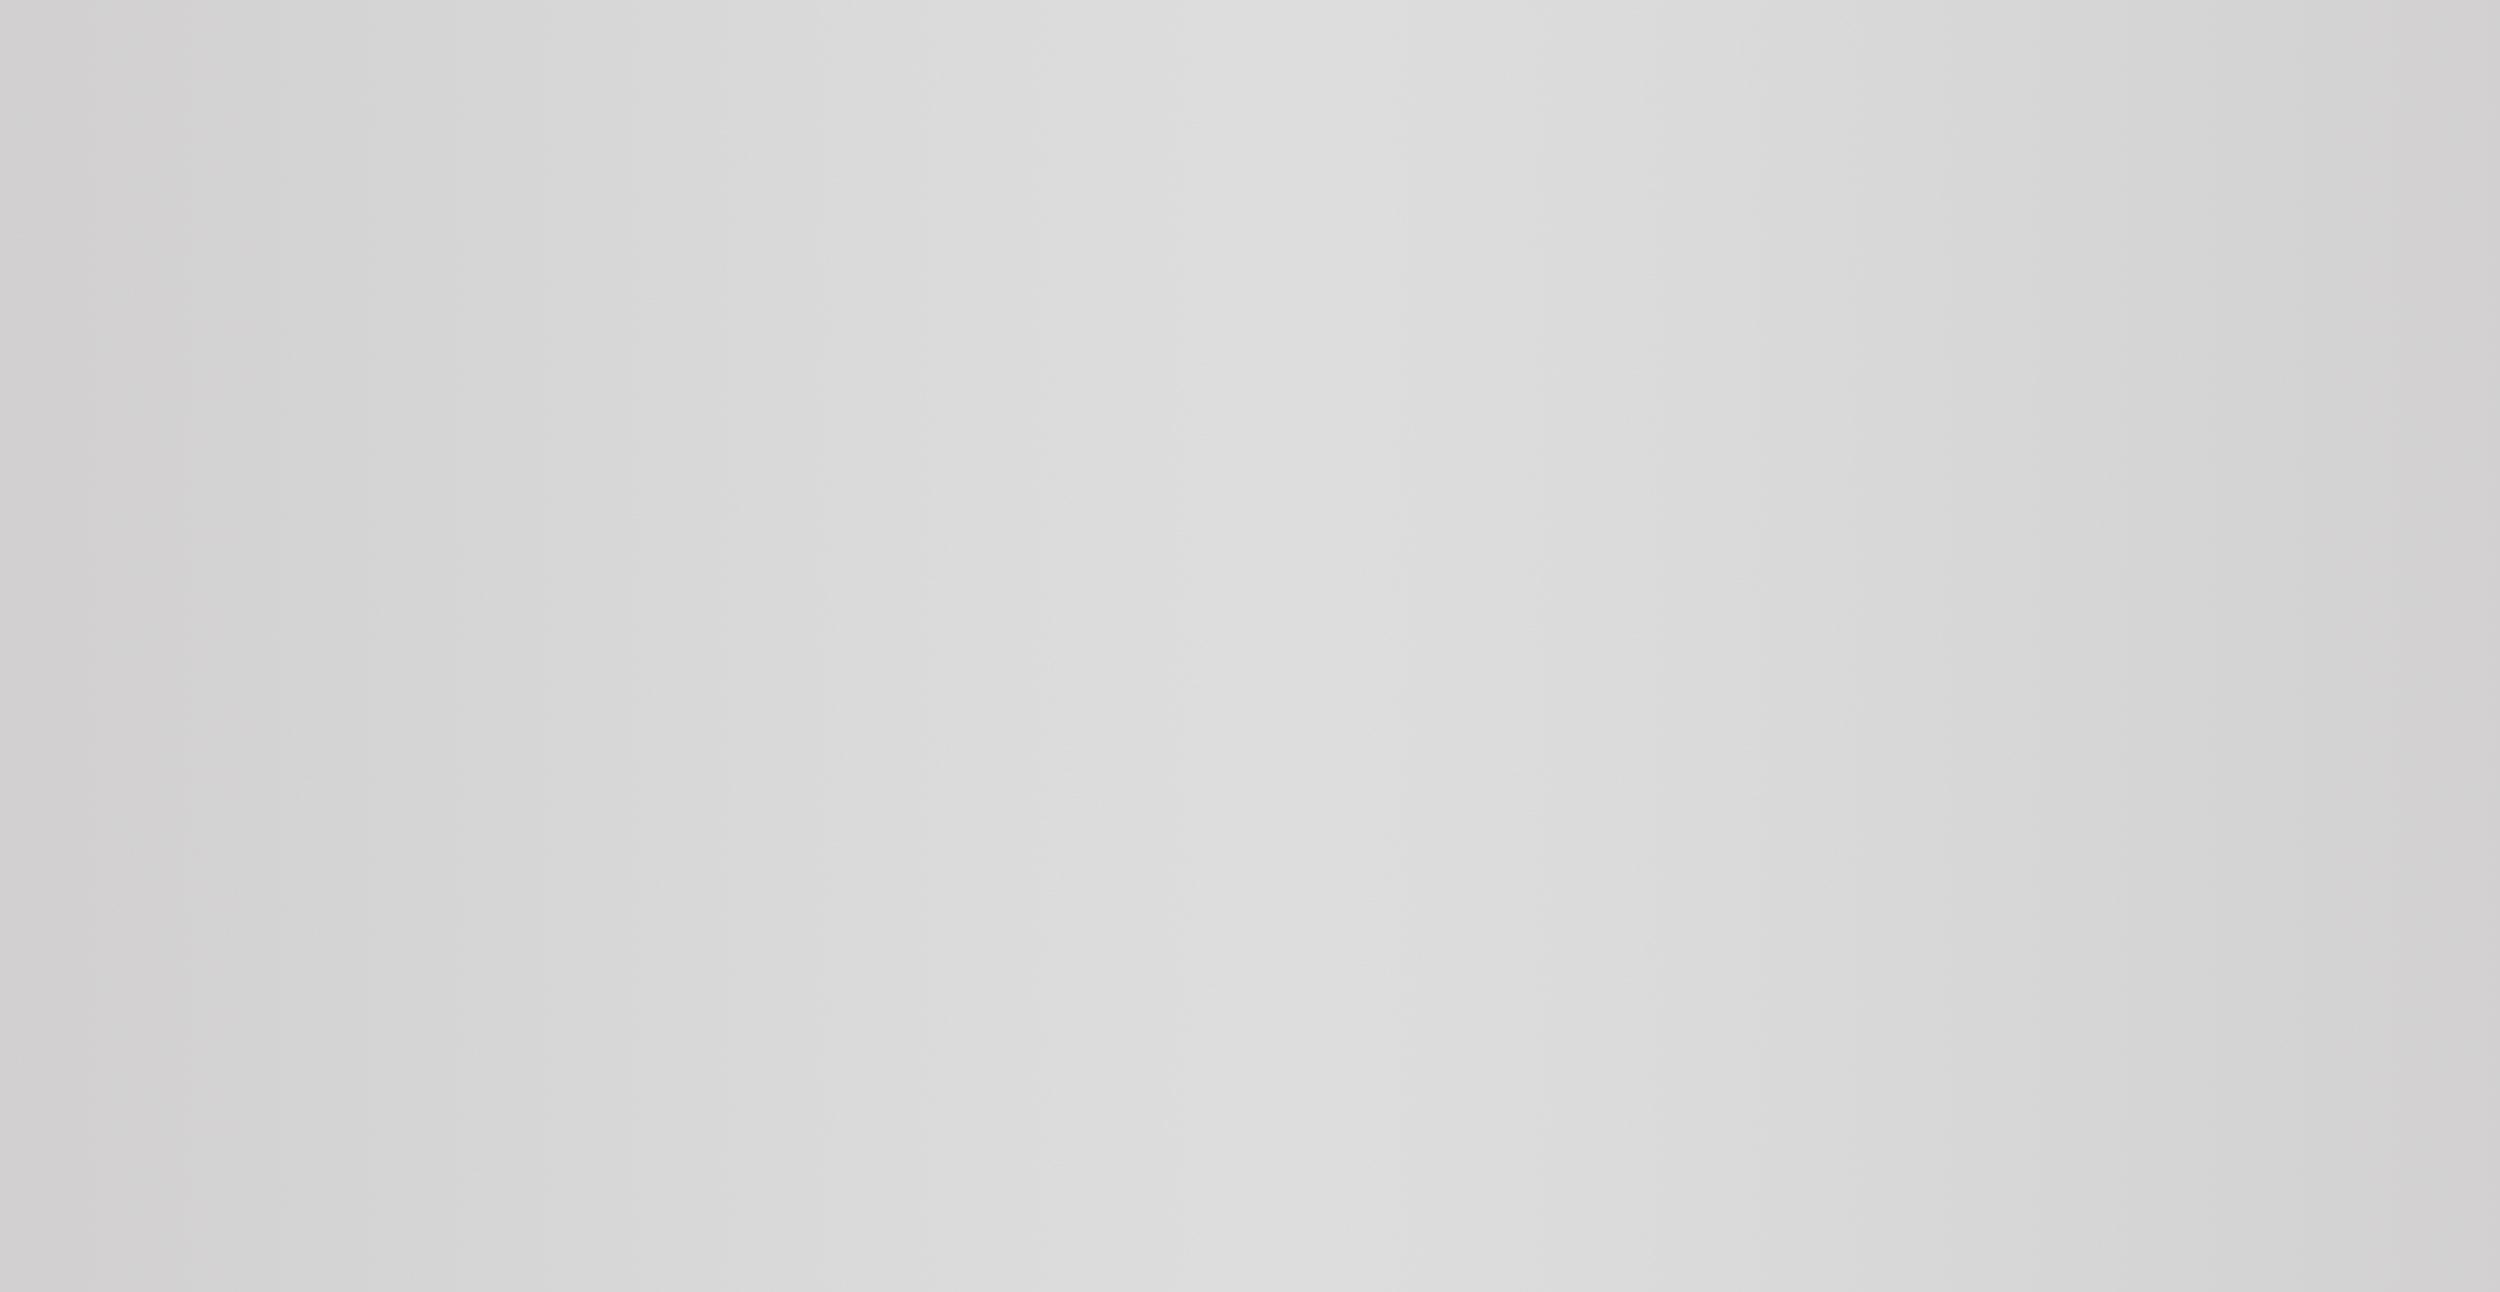 hexagon-gray.jpg